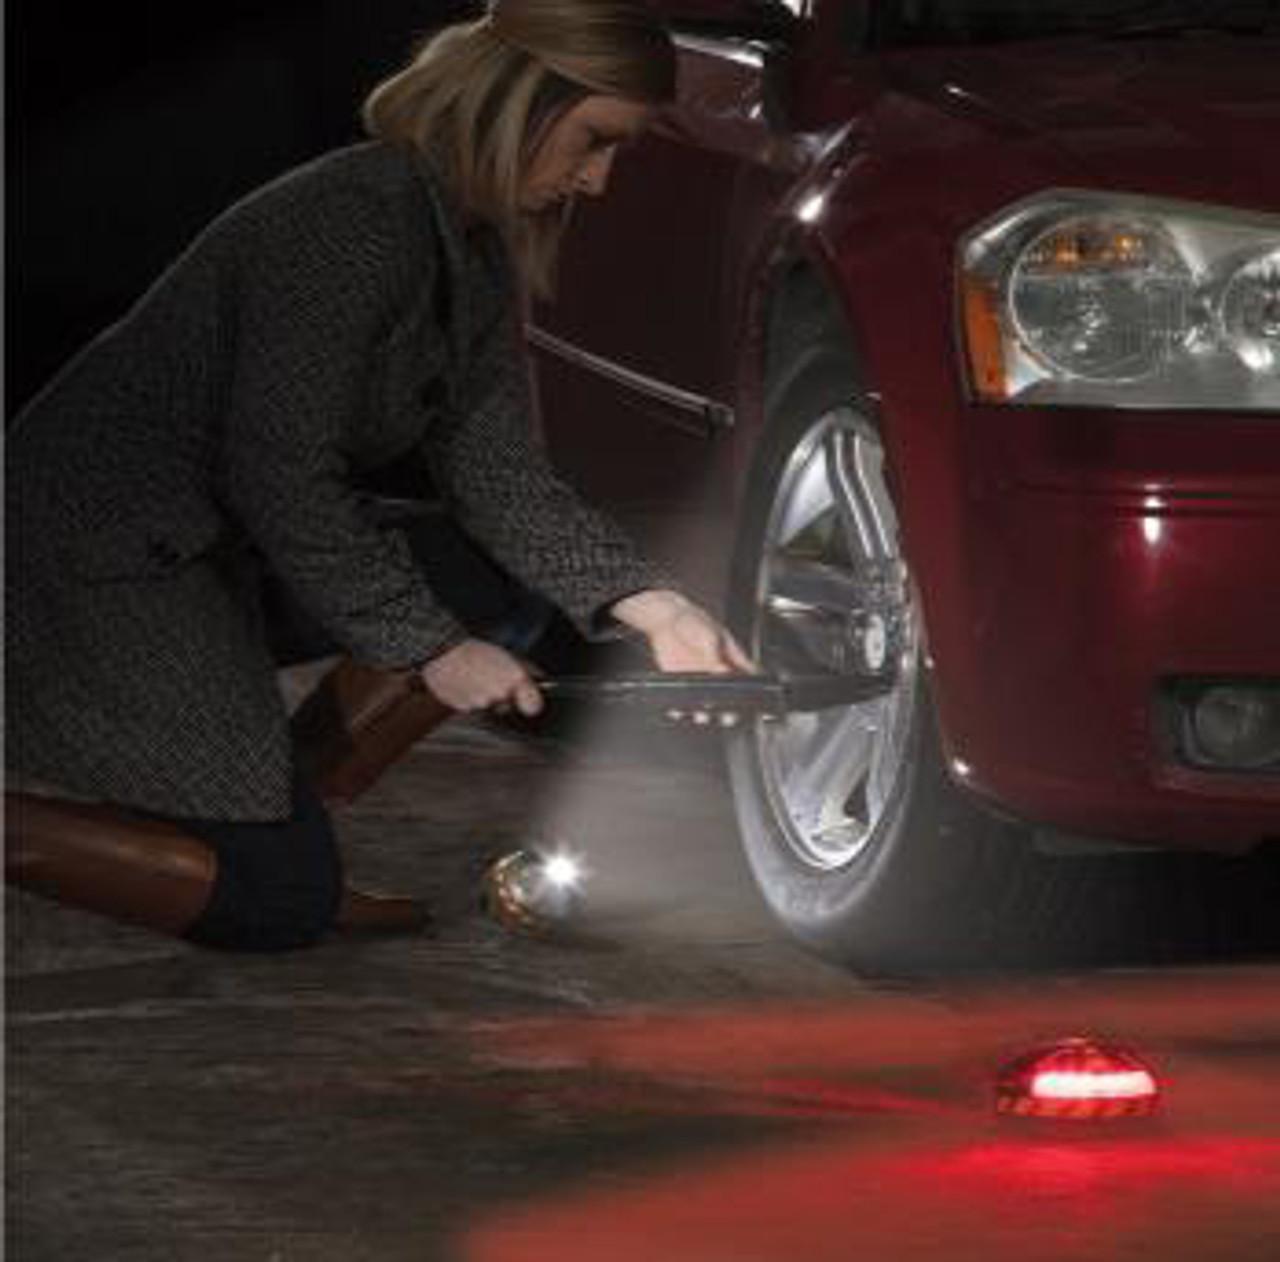 PD110200  --- POD Hazard Roadside LED